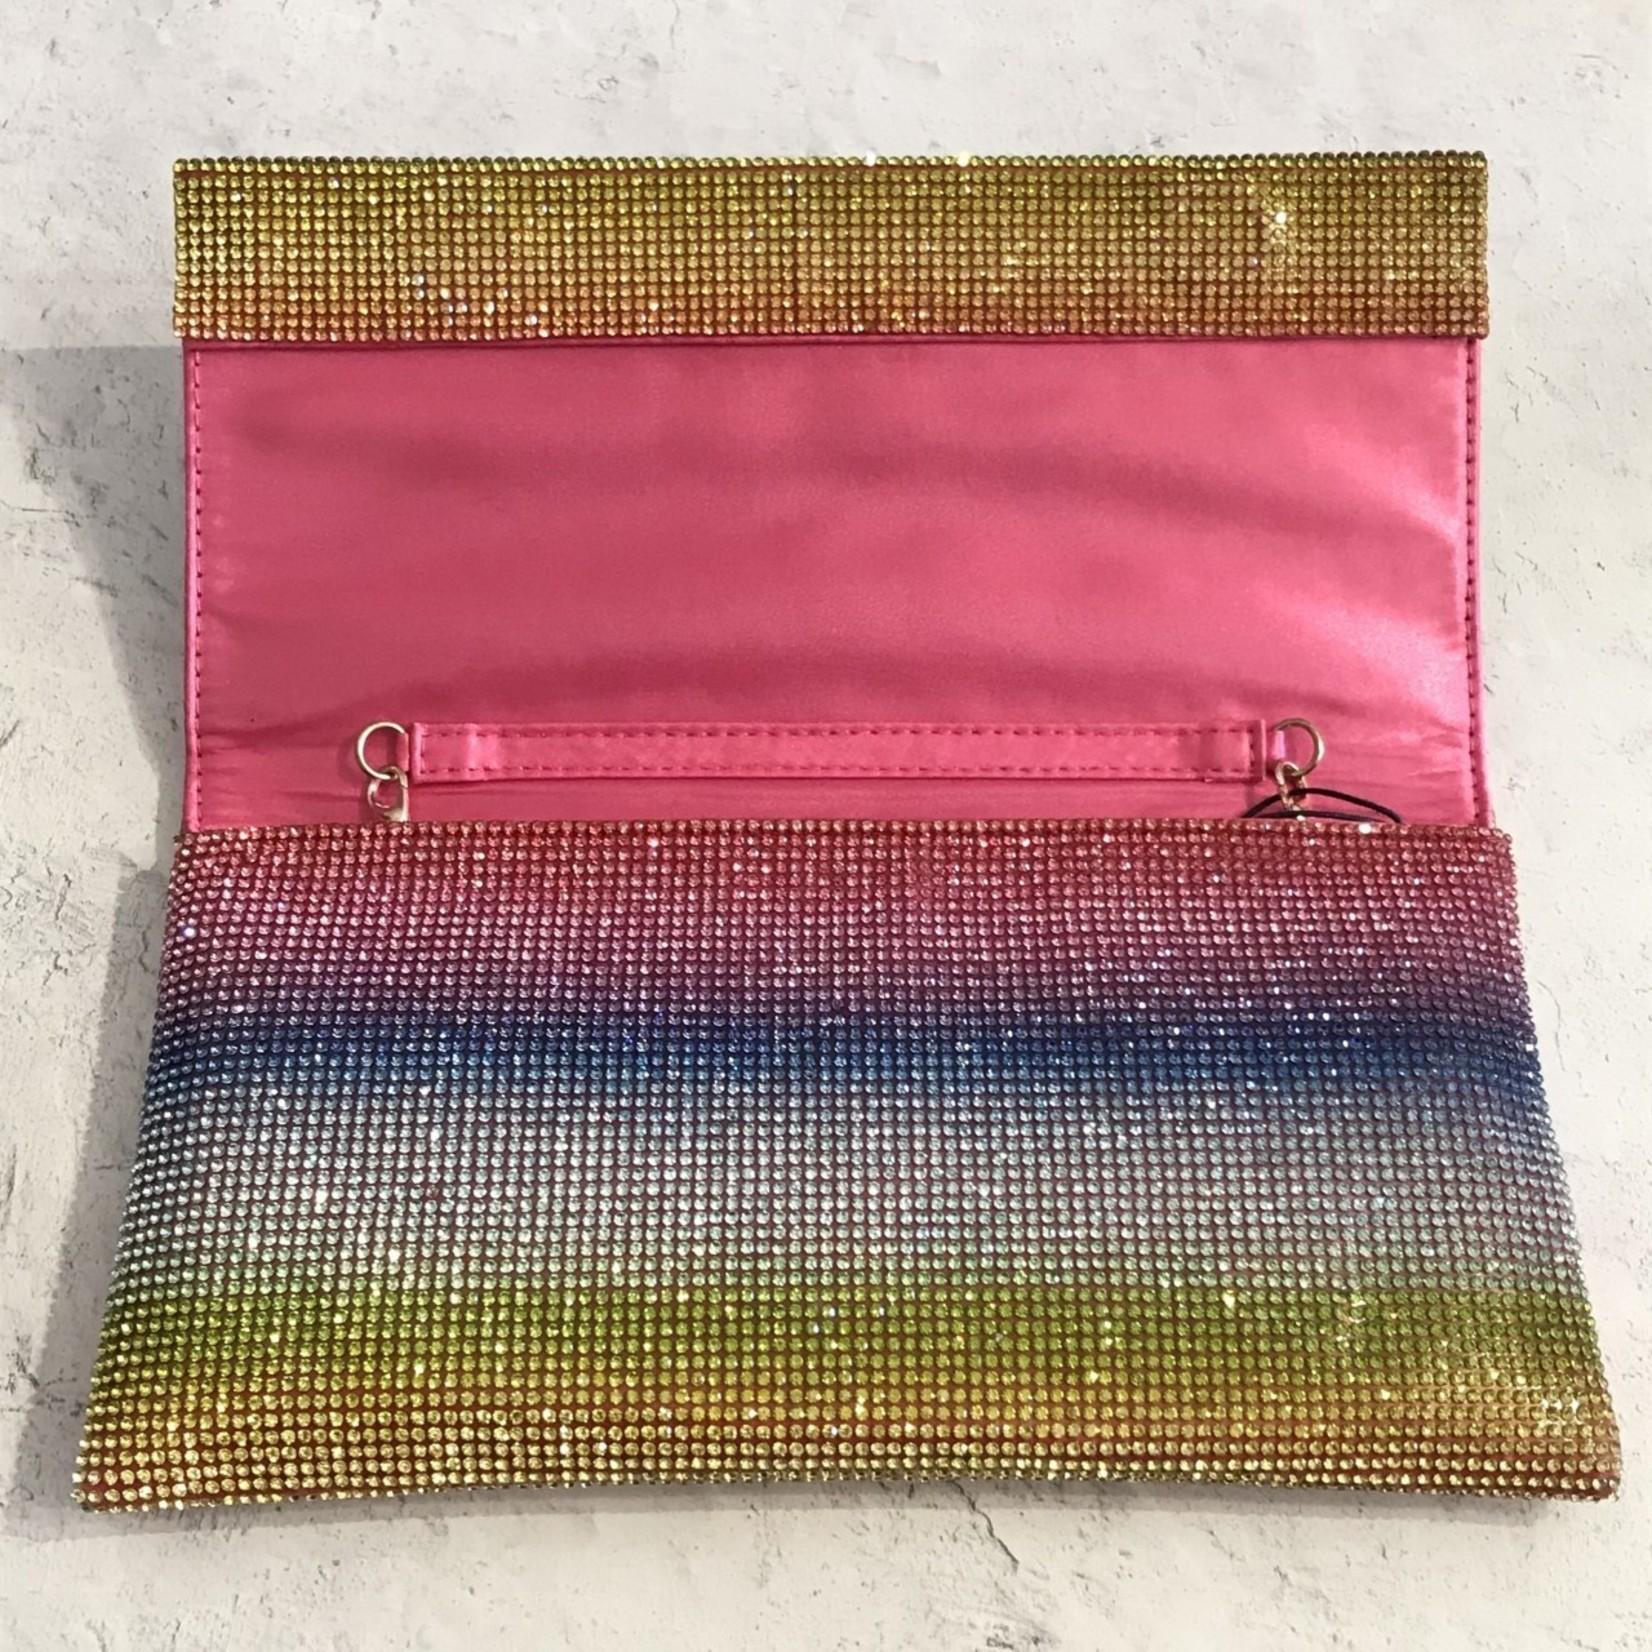 Roberts Veneto Crystal Rainbow Striped Clutch